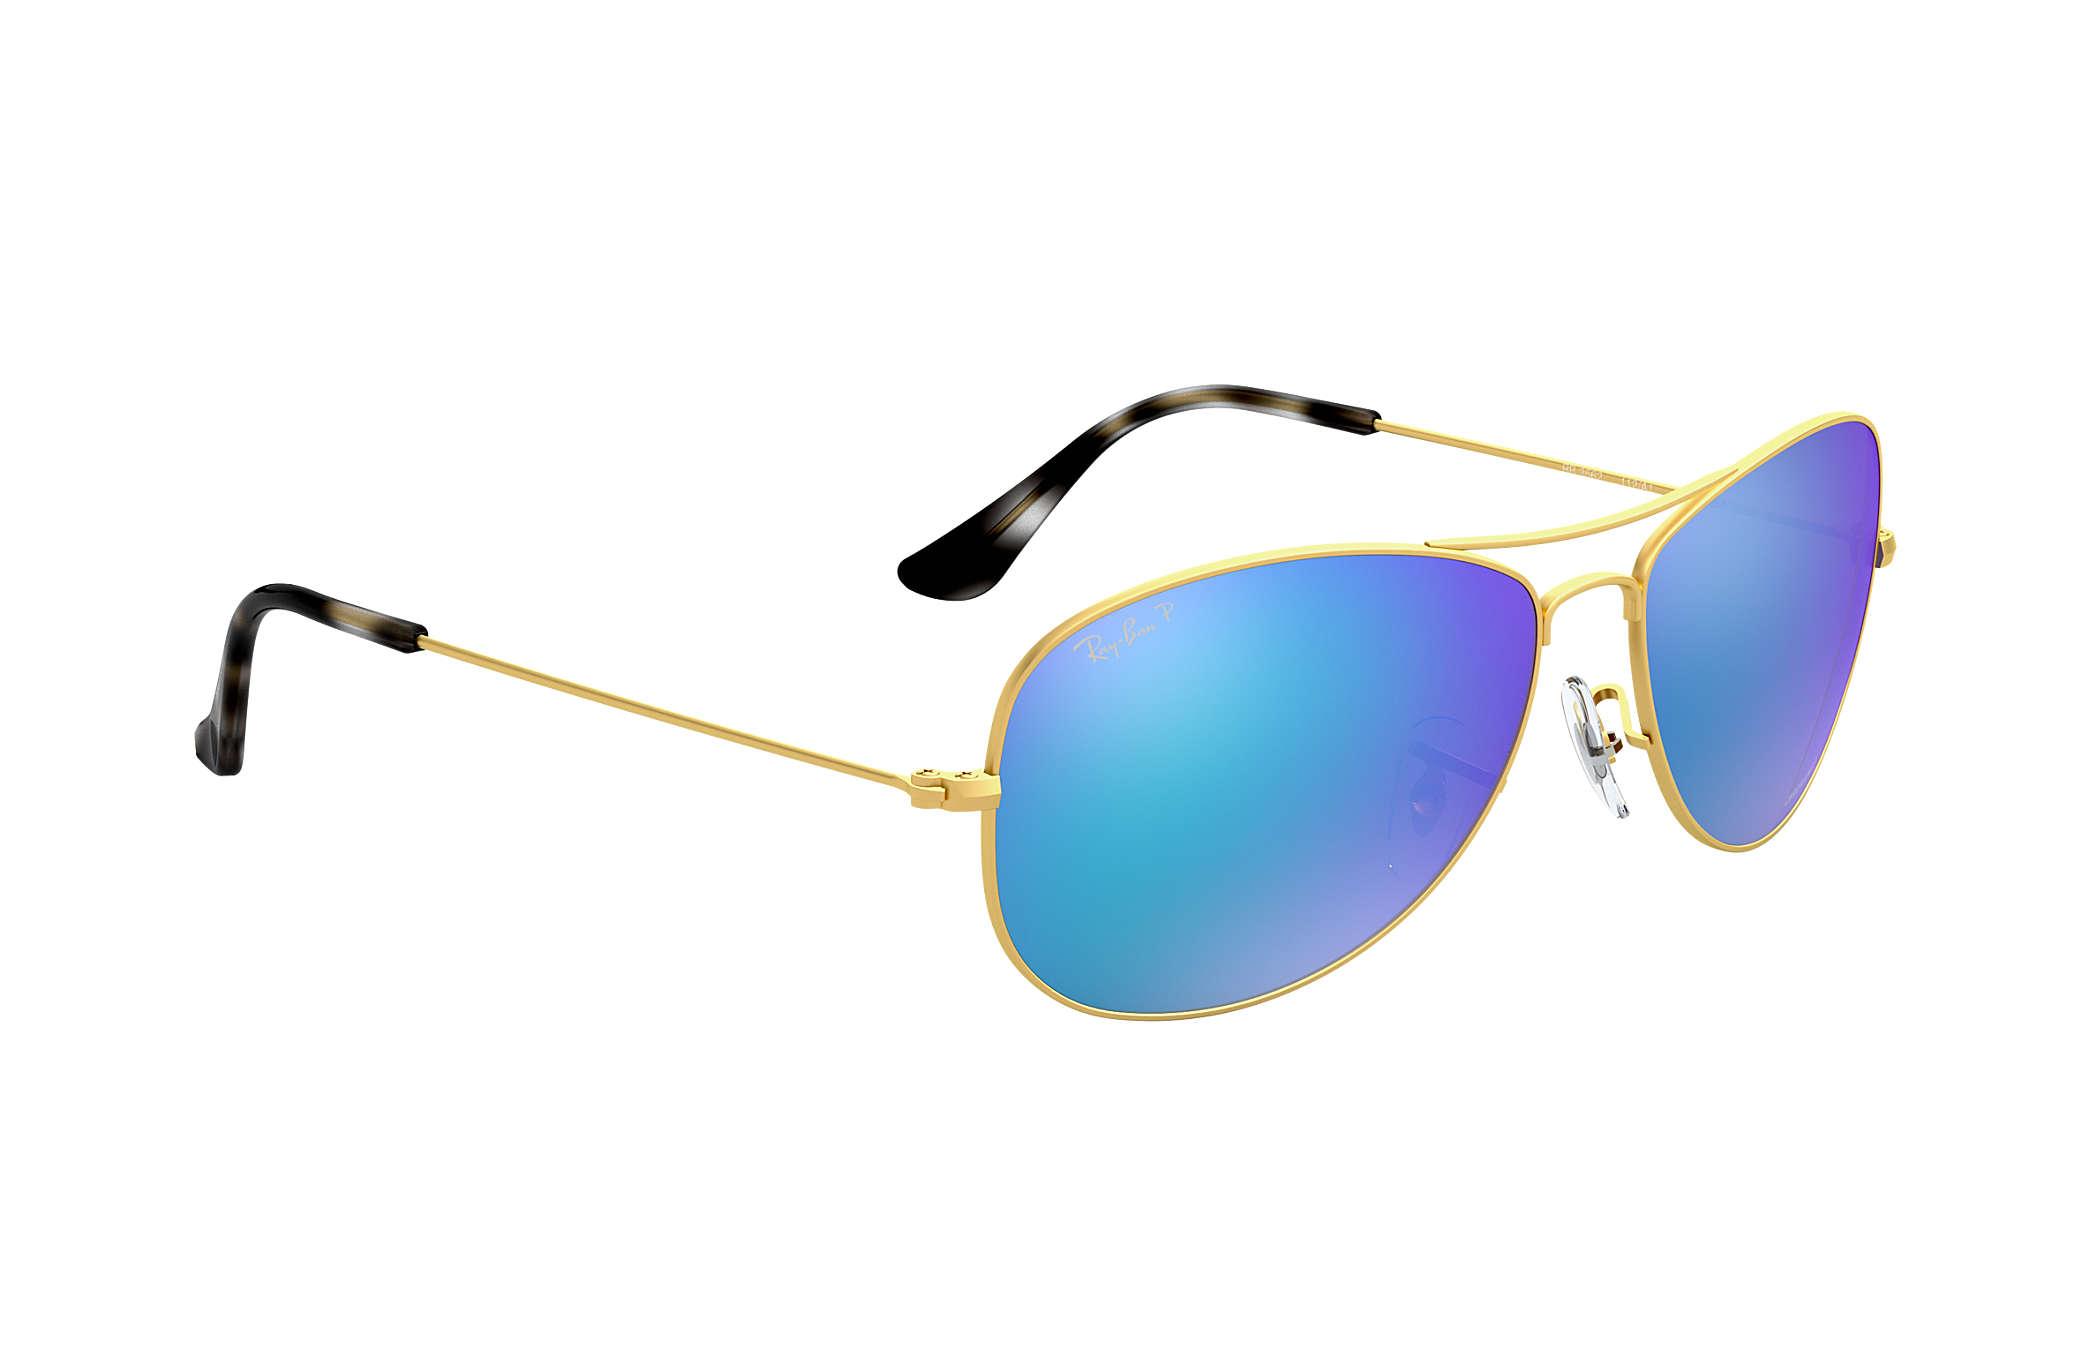 6d190e75f1a Ray-Ban Rb3562 Chromance RB3562 Gold - Metal - Blue Polarized Lenses ...